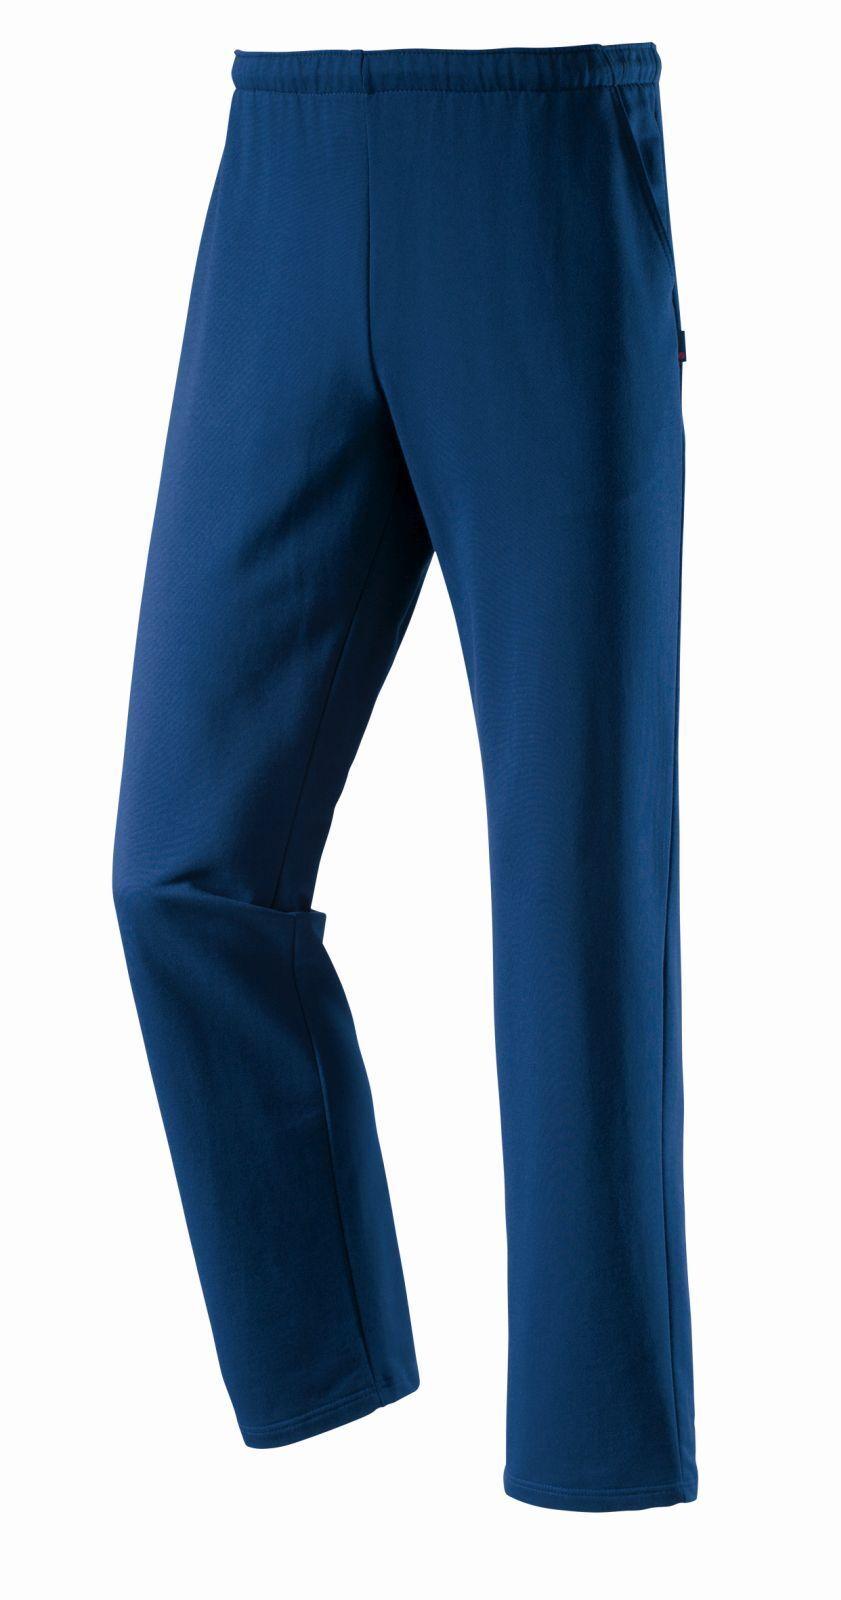 Schneider Sportswear Linzm Pantaloni men bluee Anche in Taglie Corte